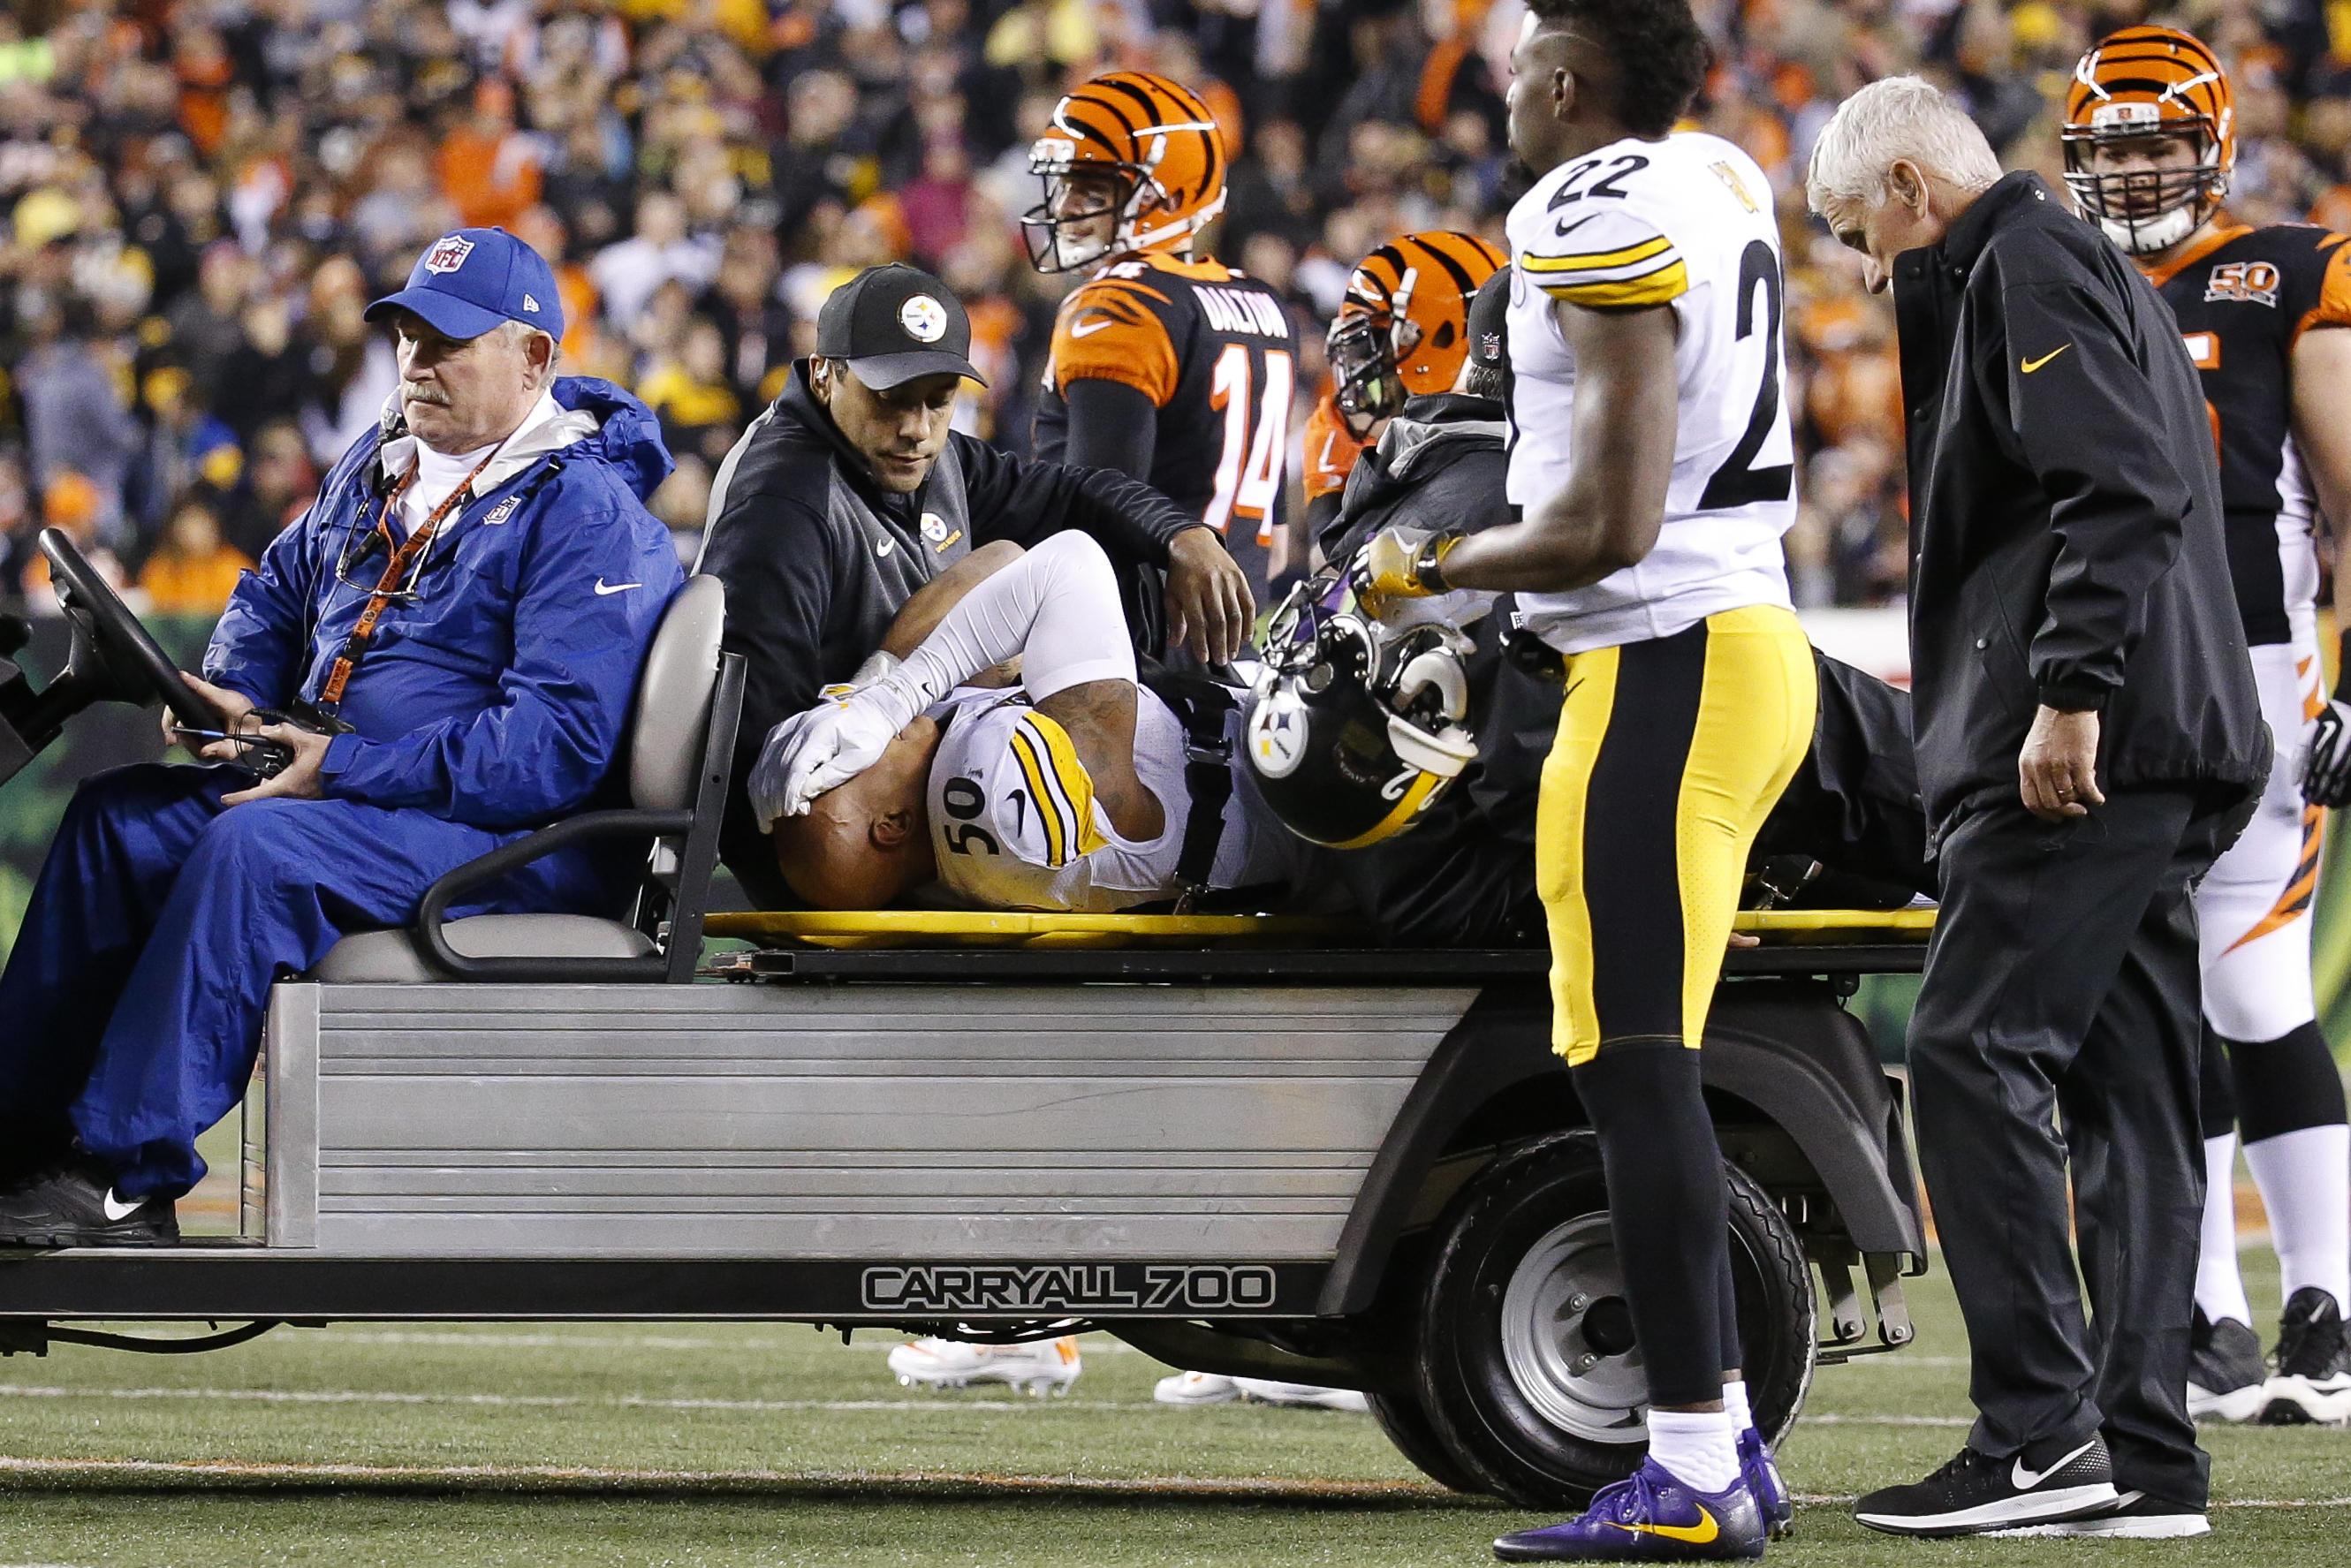 hot sale online ad56a 9084d Steelers' Ryan Shazier, Bengals' Vontaze Burfict injured in ...